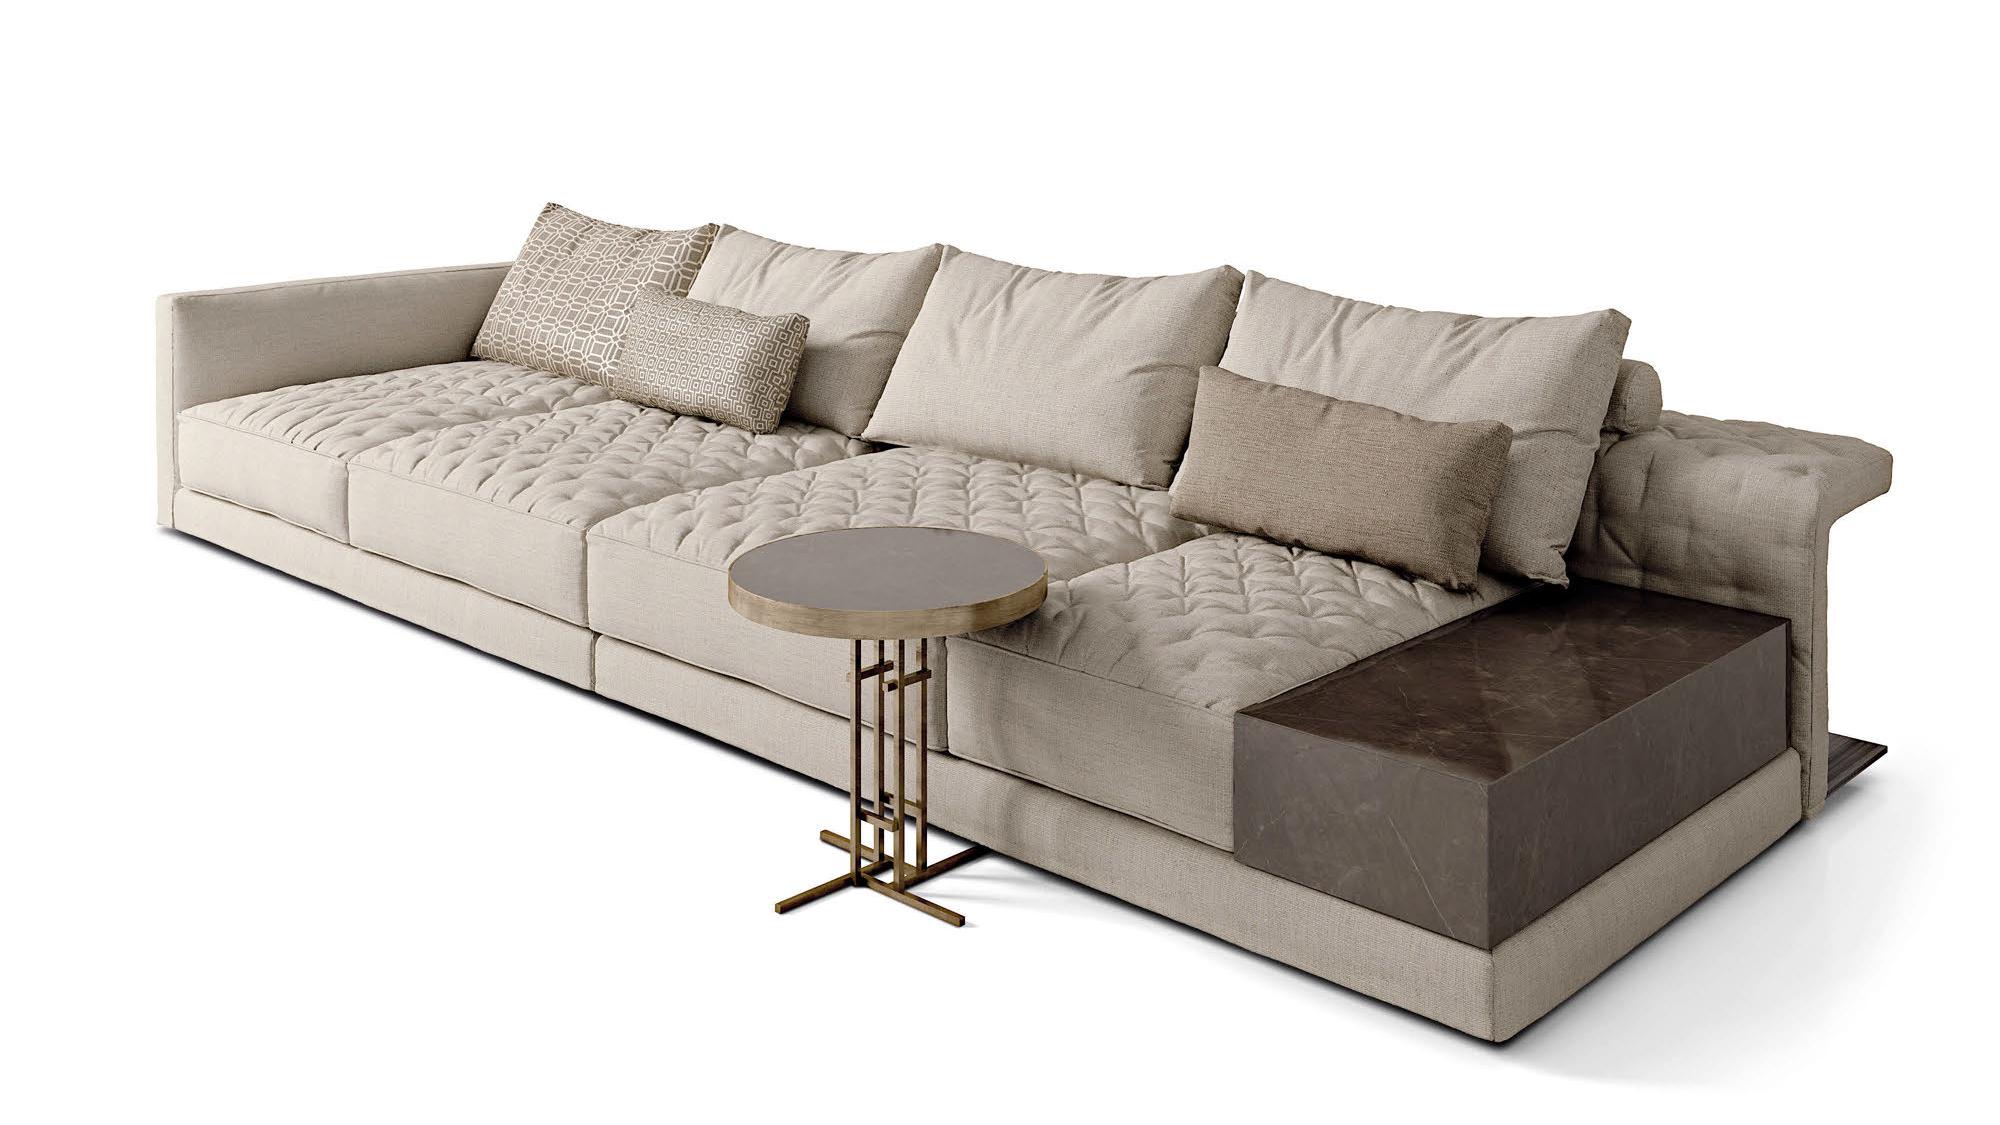 frigerio salotti мягкая мебель